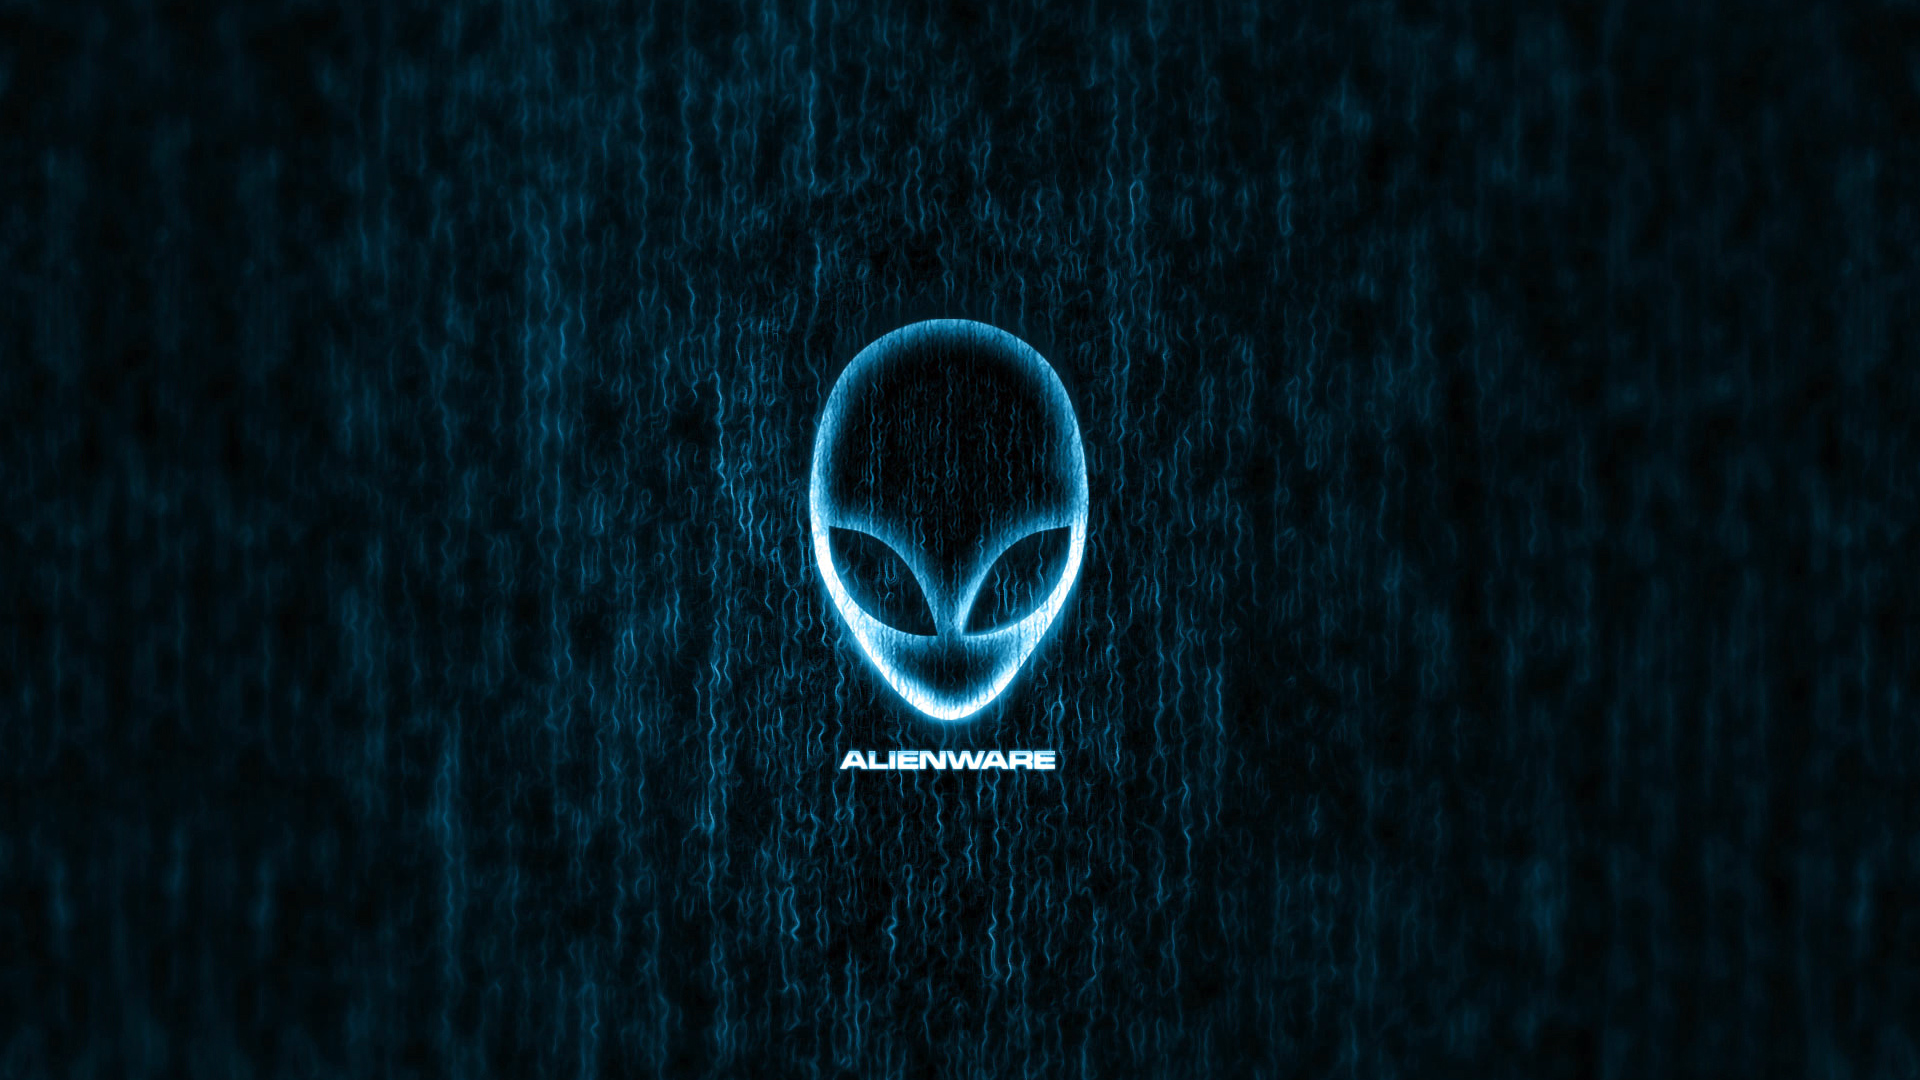 Alienware logo image 17 wallpaper hd alienware logo light blue dark hd voltagebd Image collections